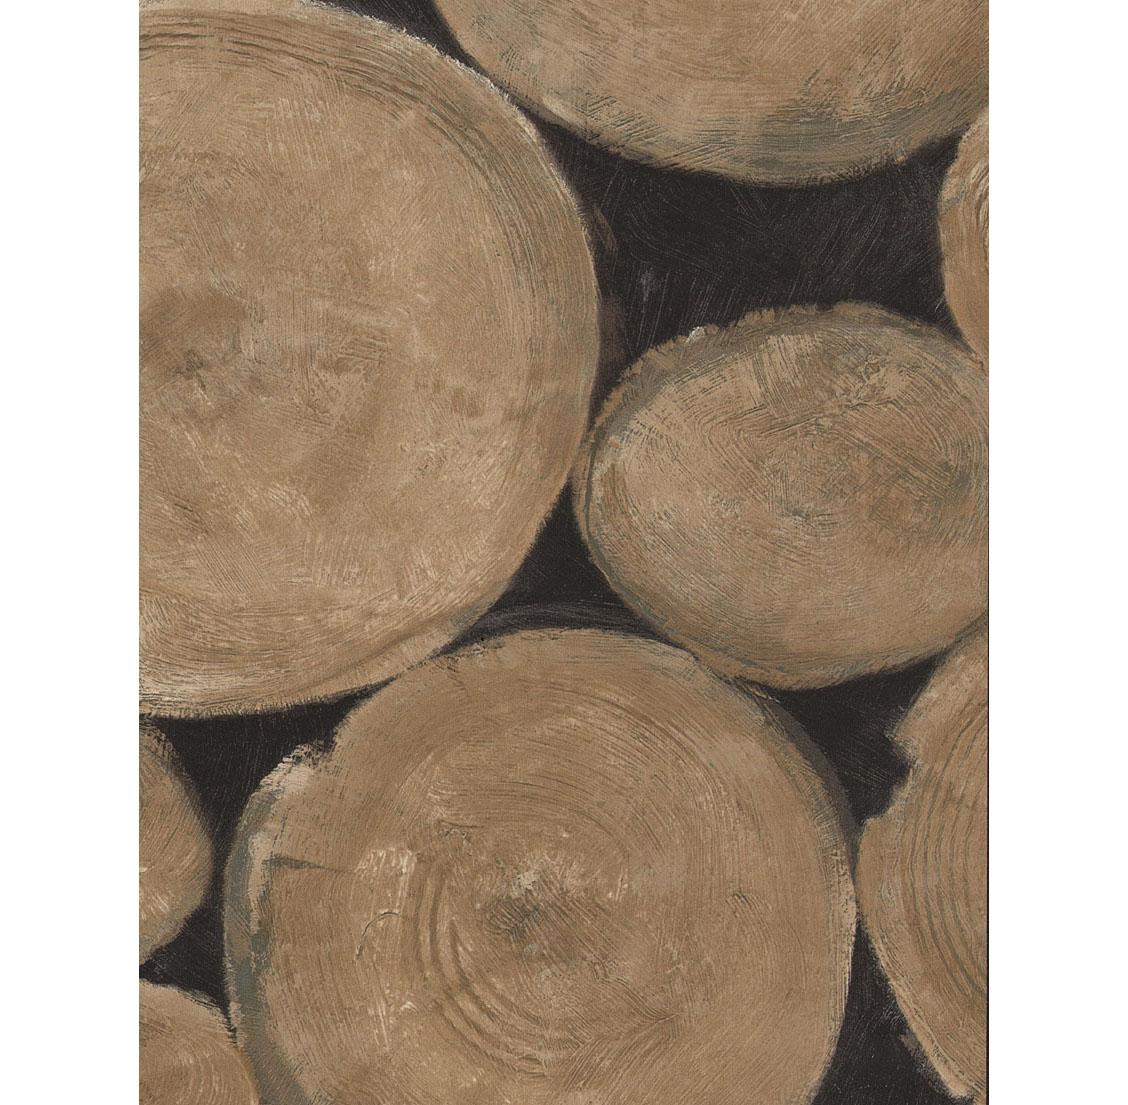 Rustic Lodge Wooden Log Ends Wallpaper - Beech